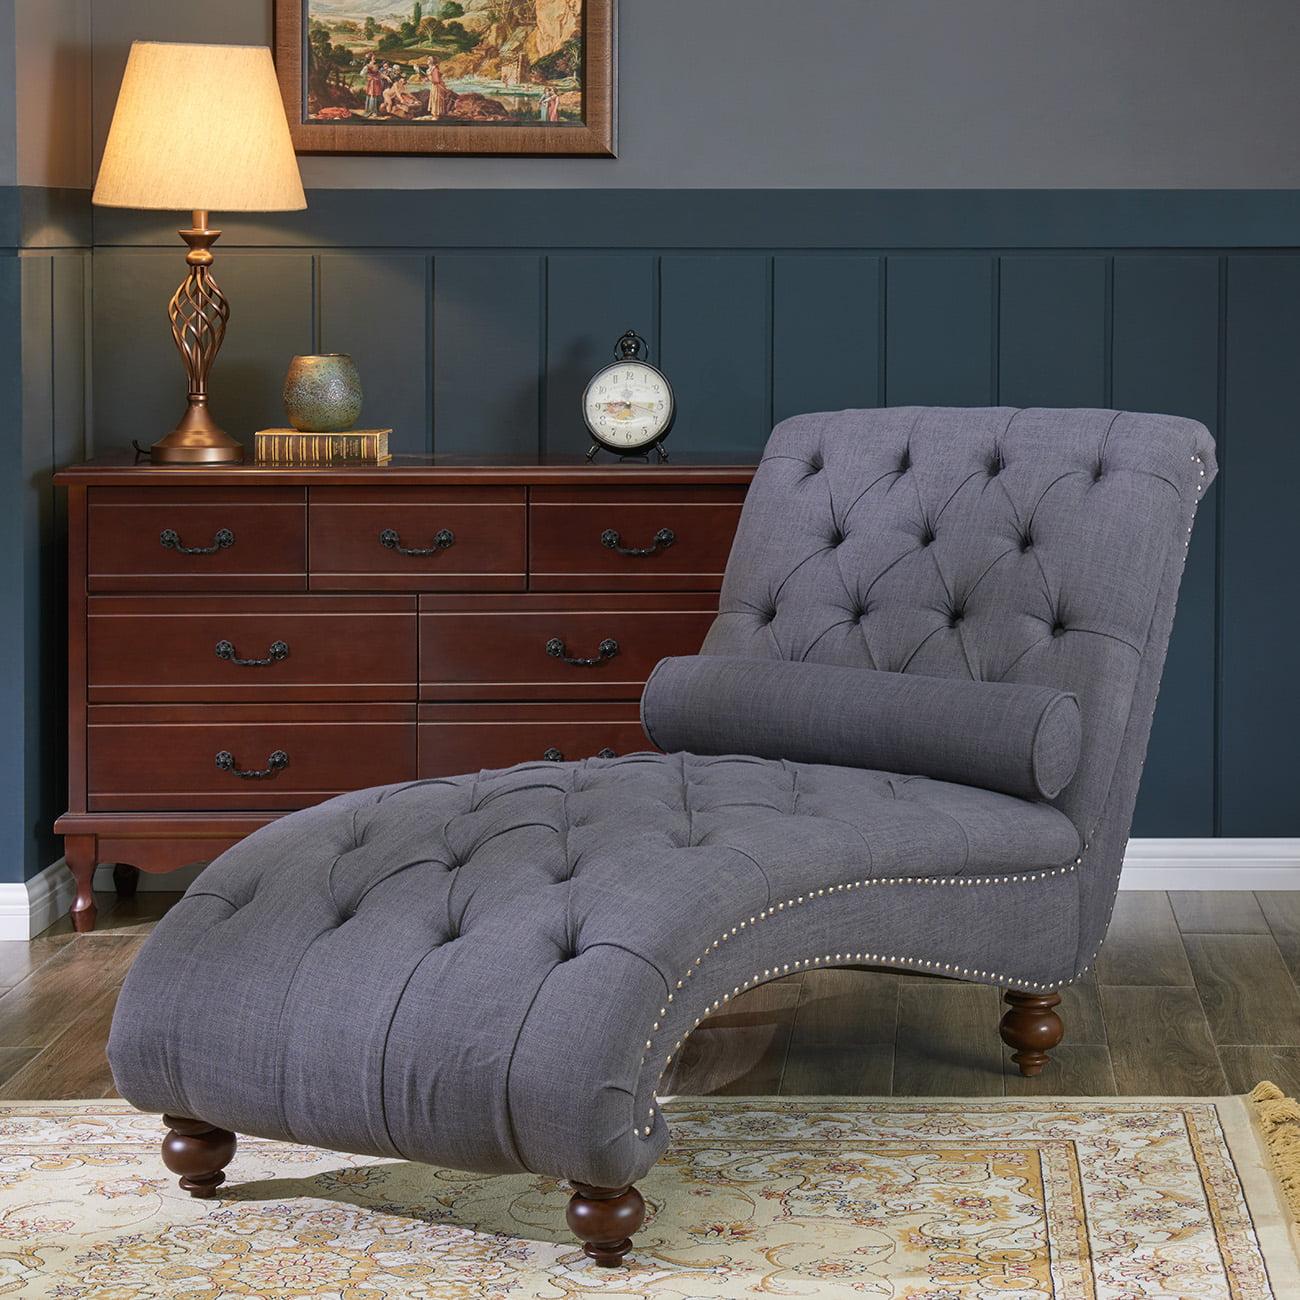 Belleze Teofila Tufted Chaise Lounge Chair Leisure Sofa ...